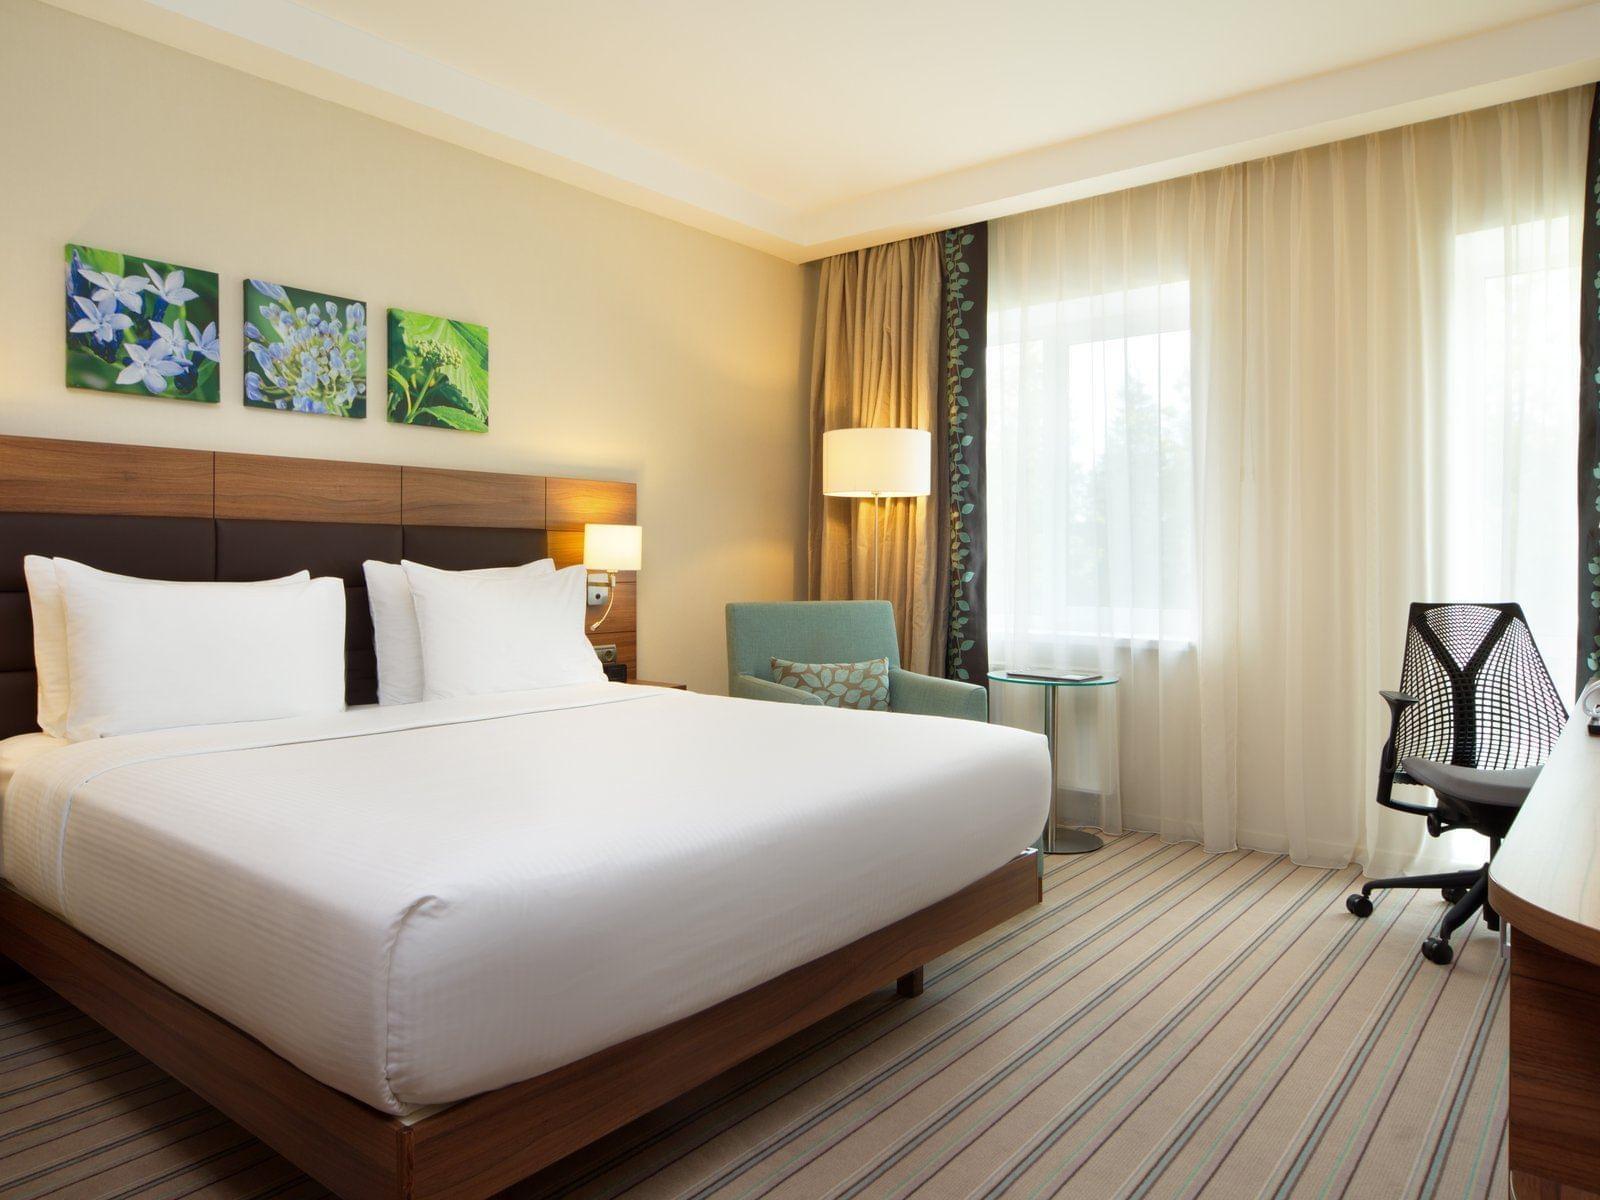 Standard Room at Hilton Garden Inn Moscow New Riga Hotel